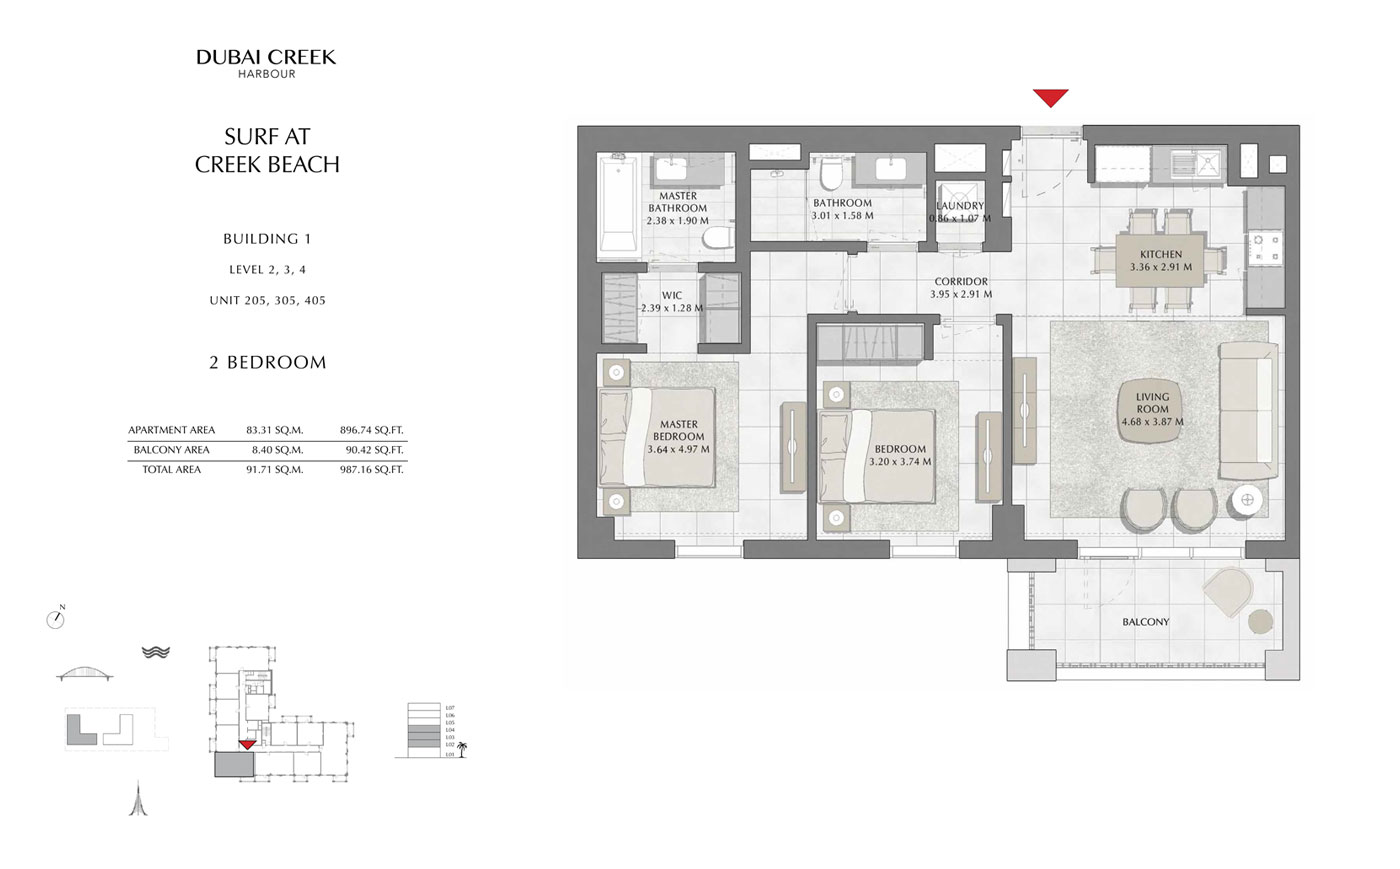 Building-1-2-Bedroom,-Level-2-3-4,-Unit-205-305-405,-Size-987 sq.ft